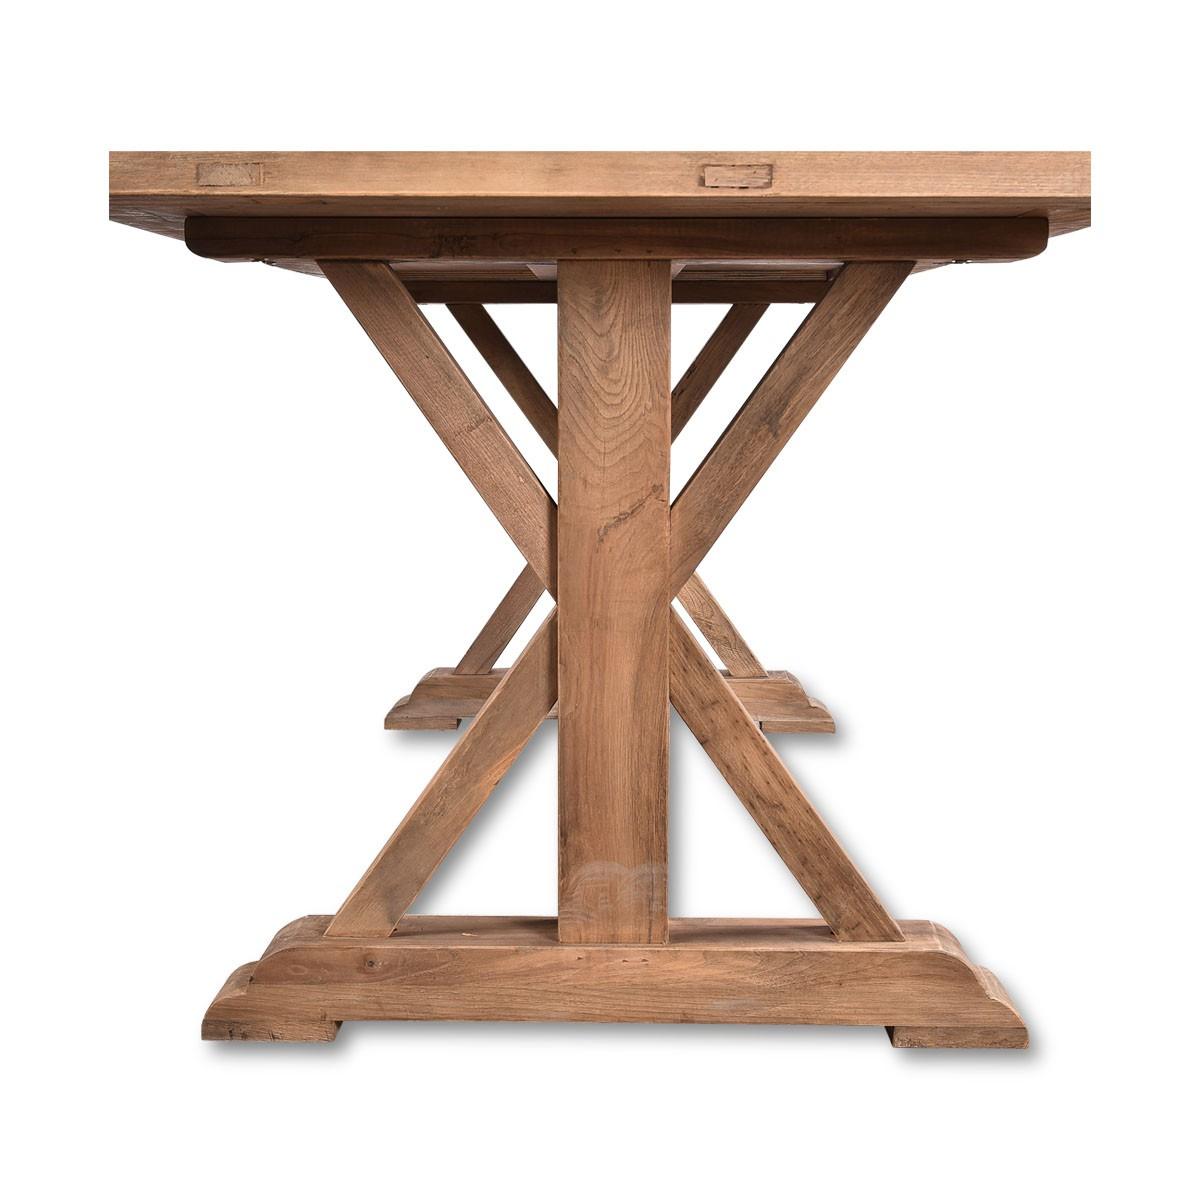 lemans rustic dining table 200cm reclaimed elm wood farmhouse wholesales direct